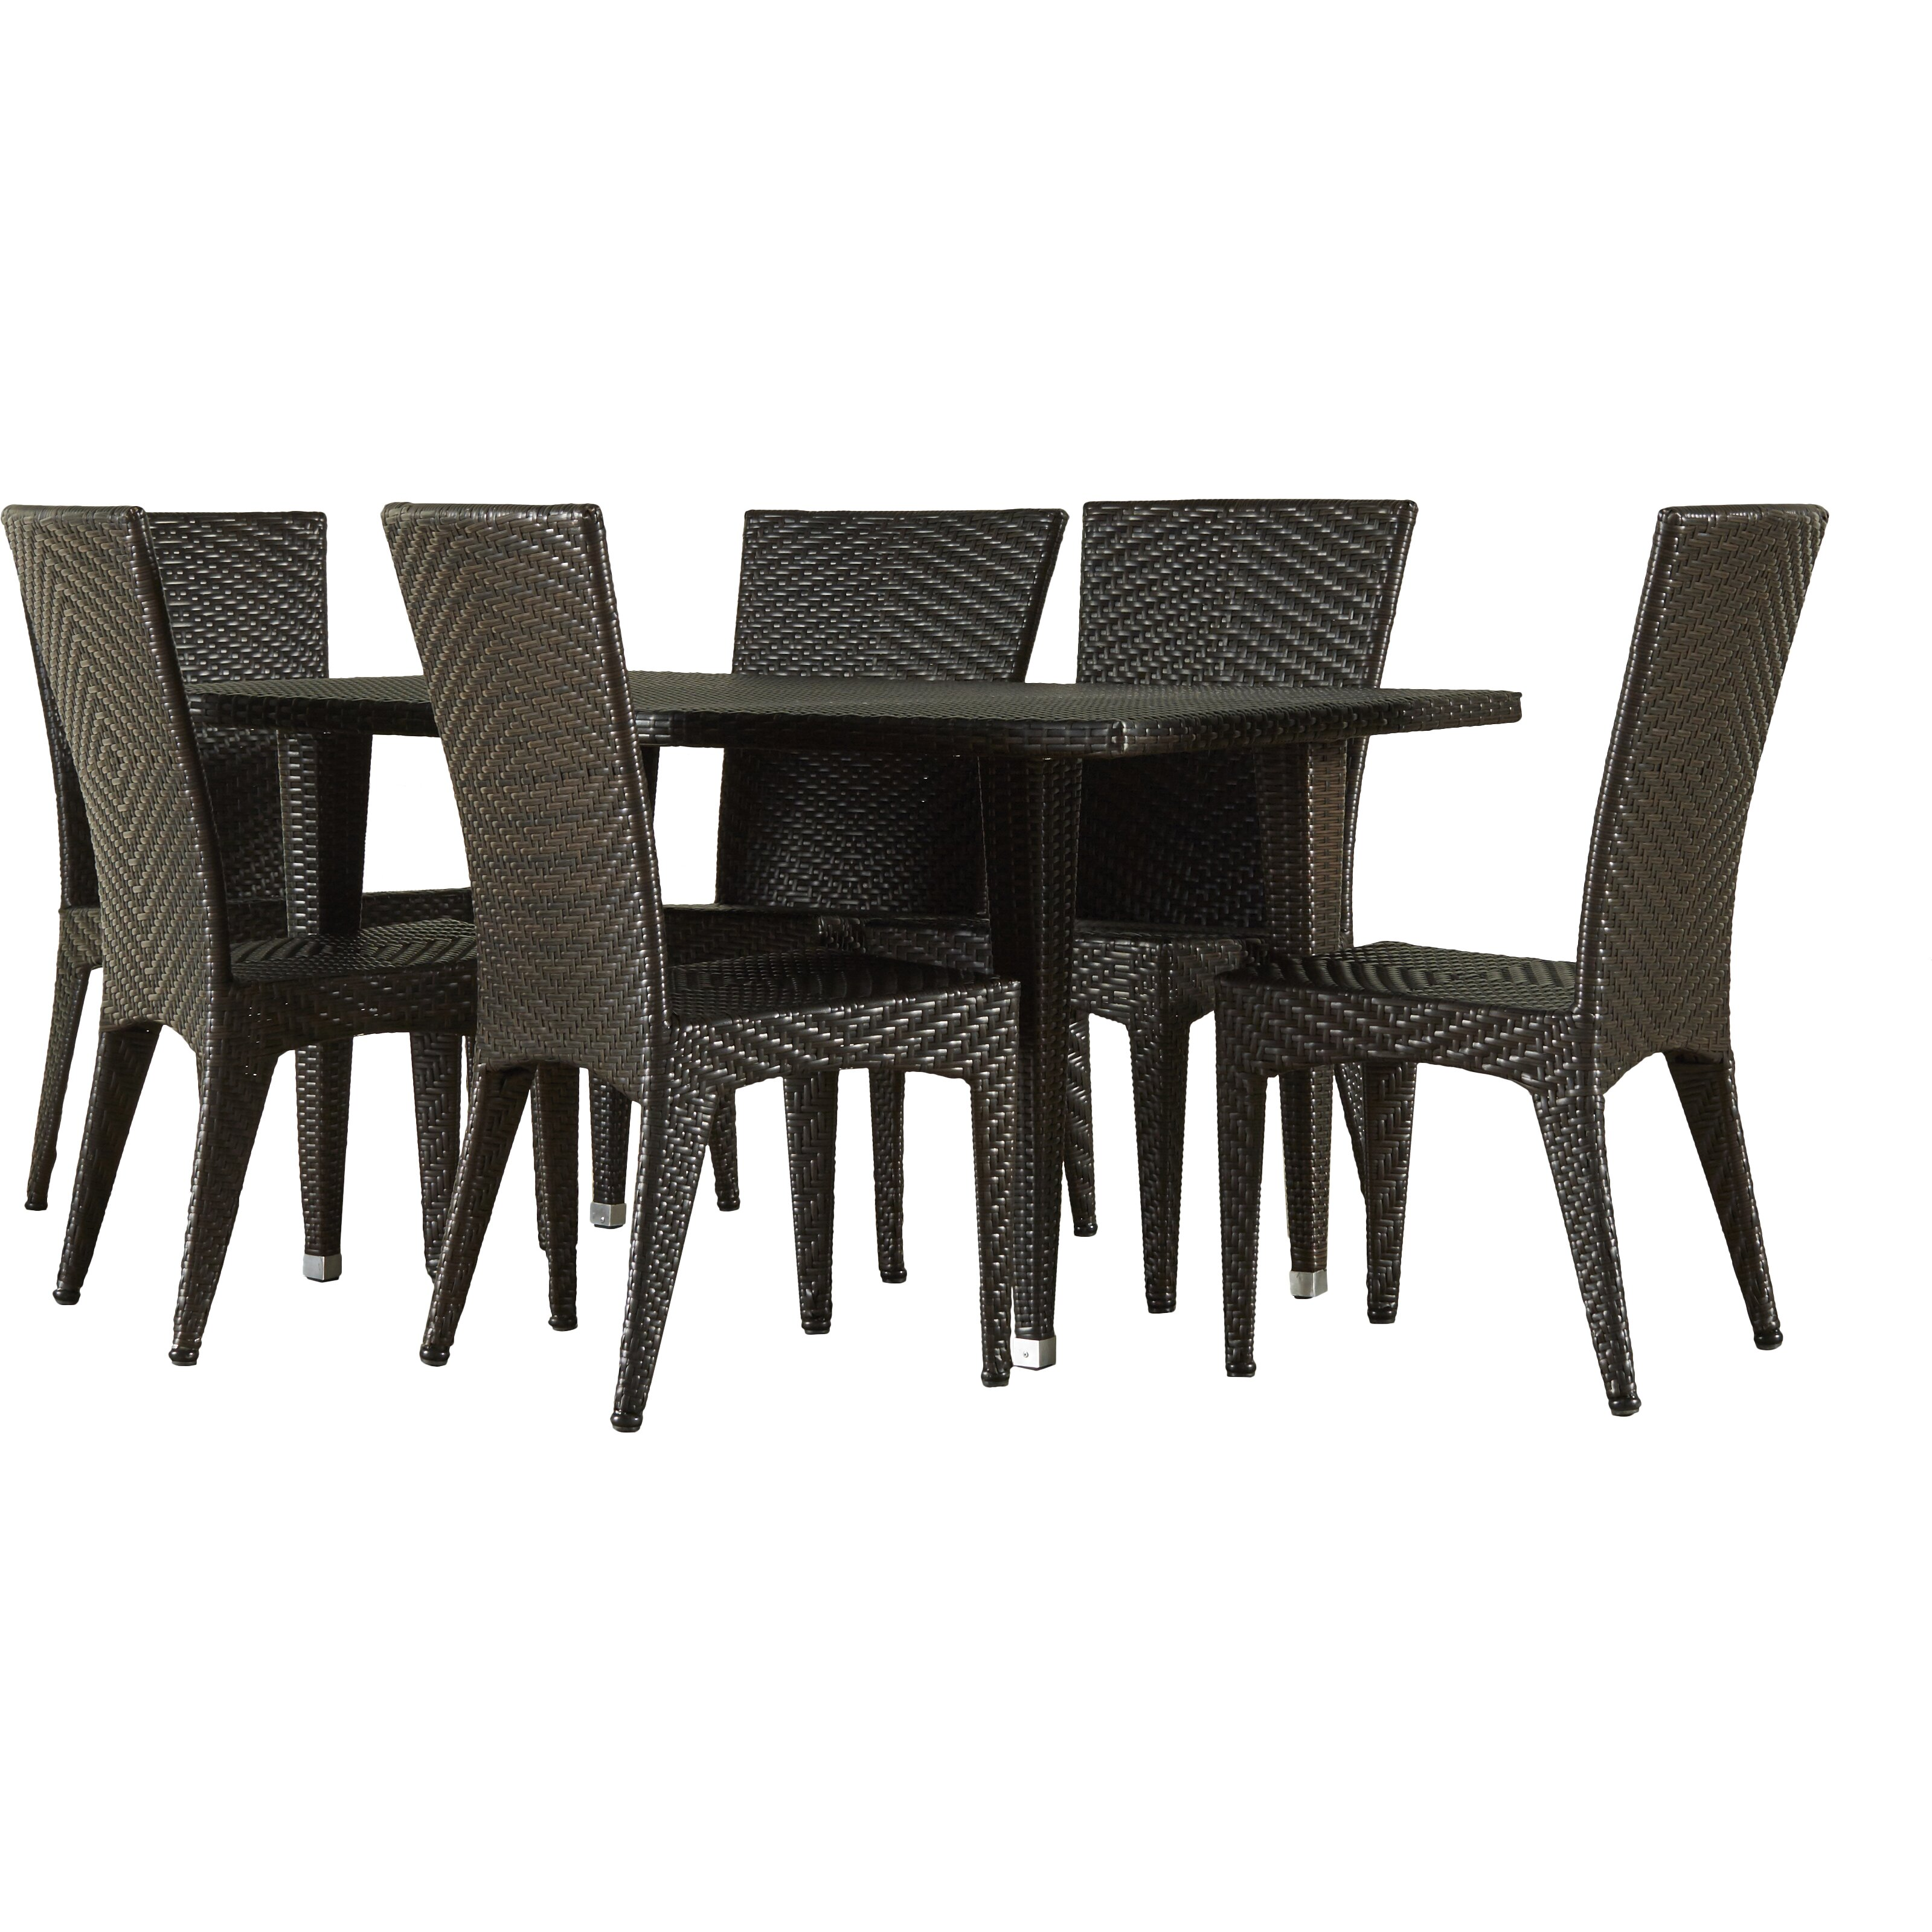 most effective #9095 7 piece dining room set under $500, elegant